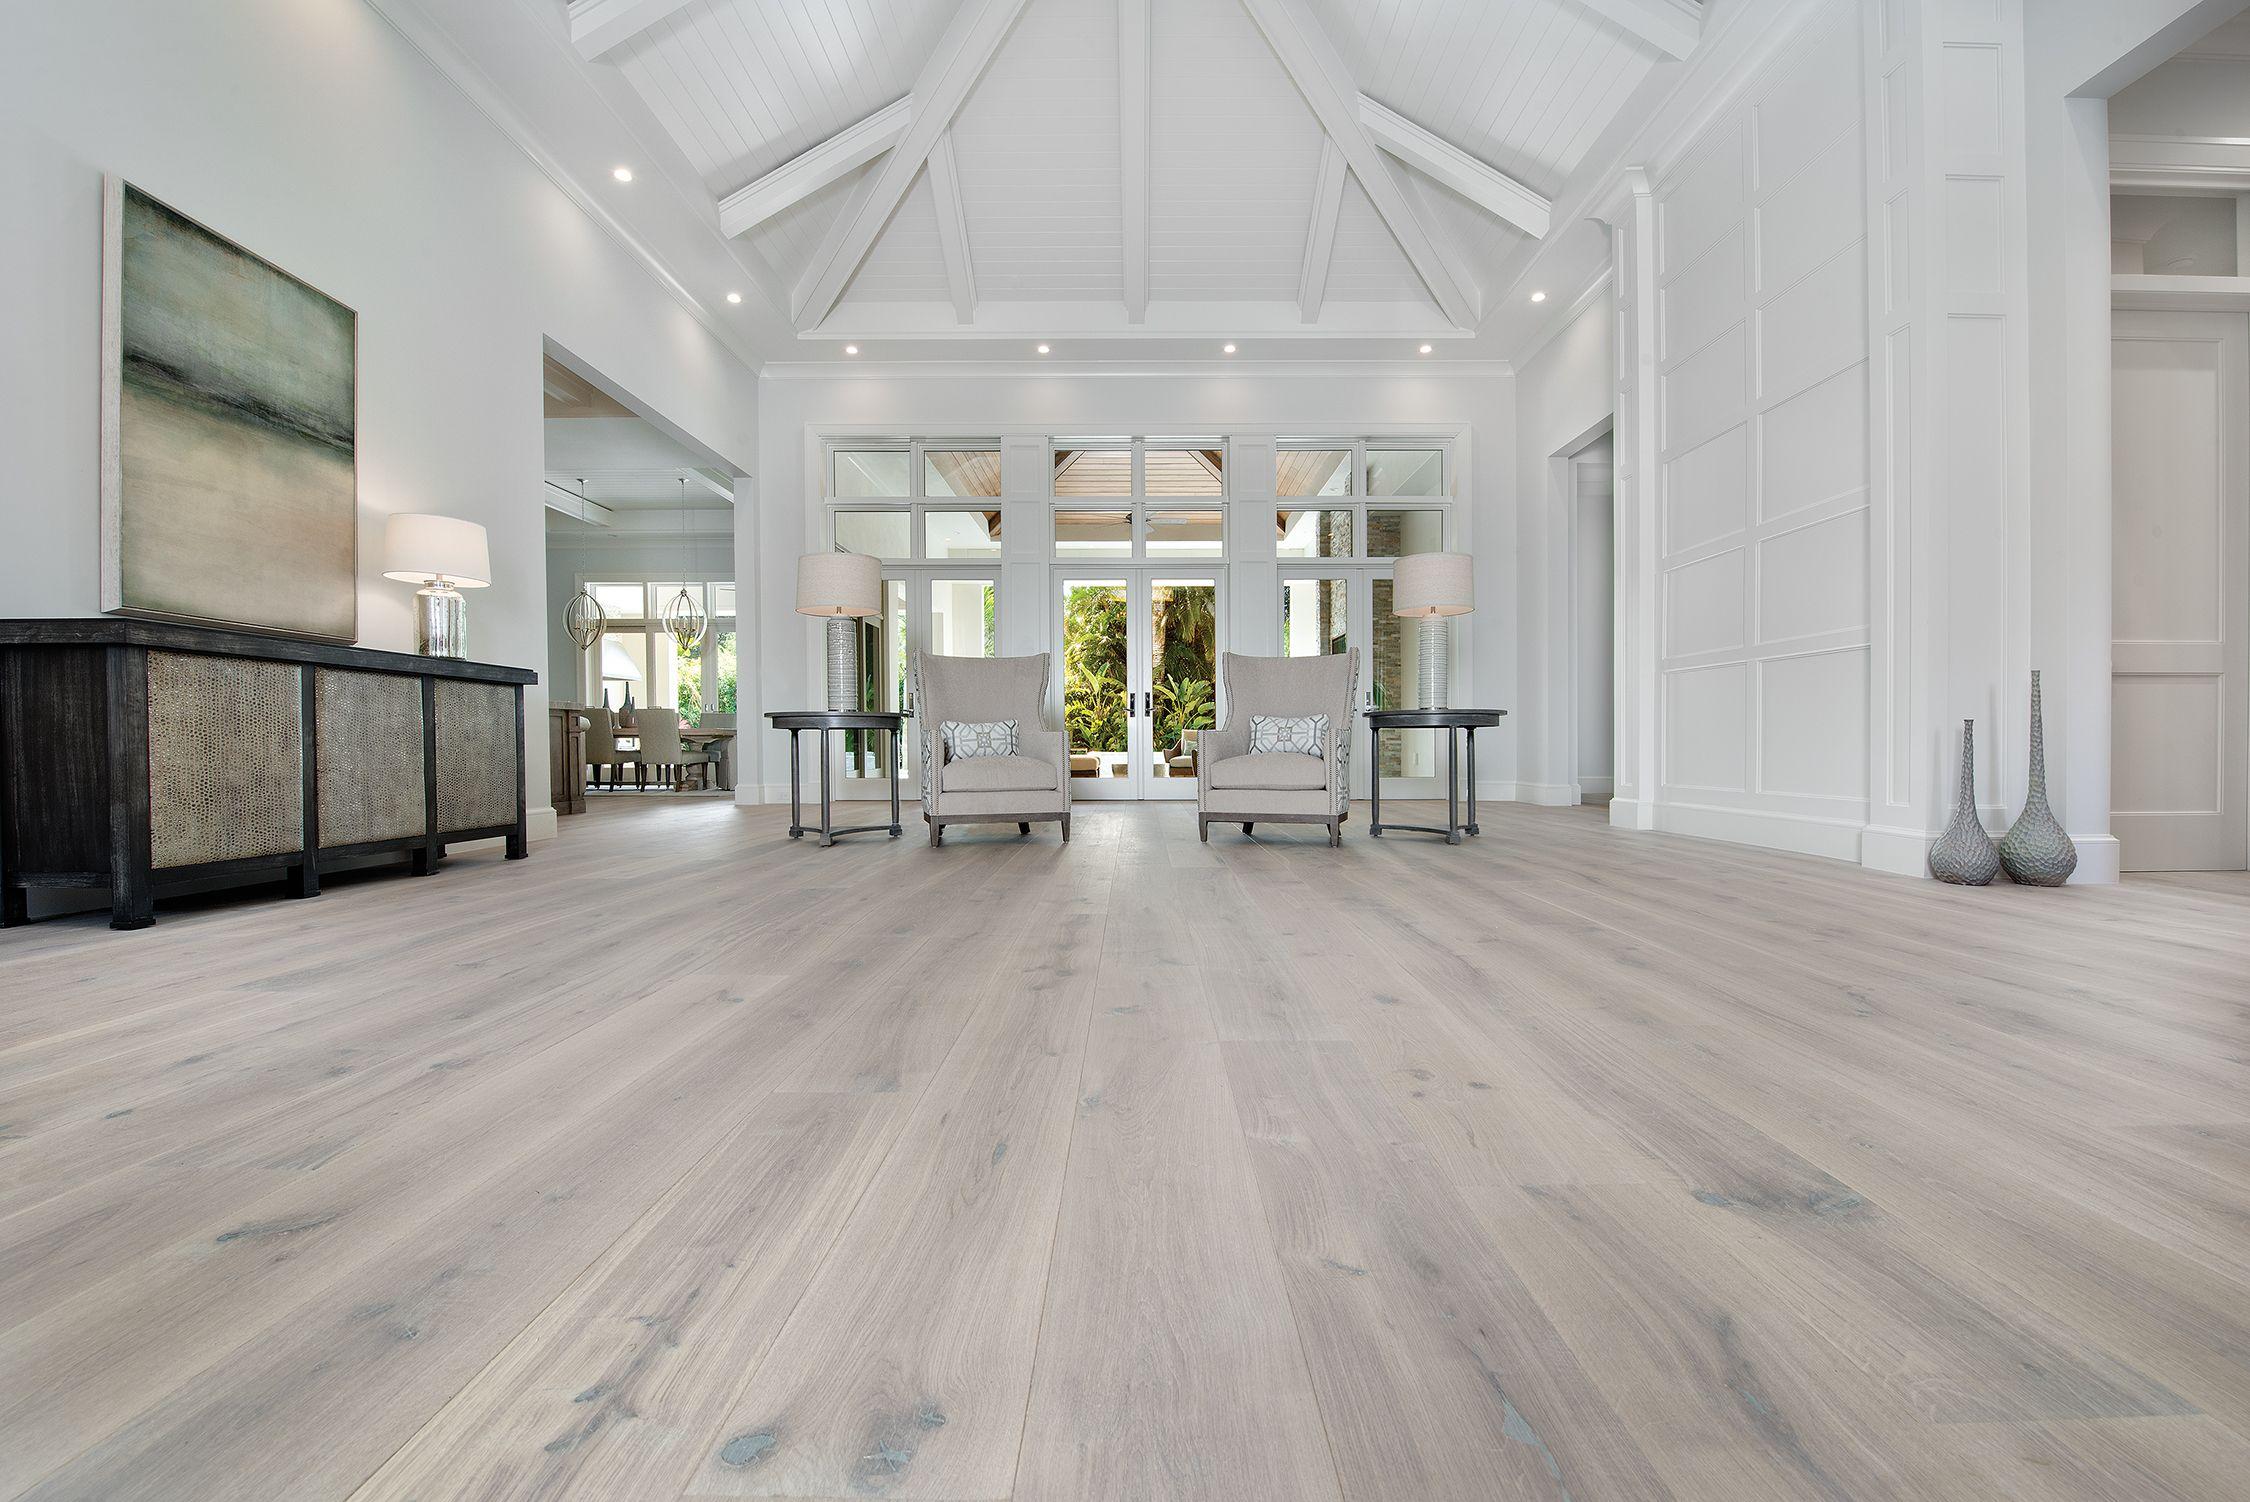 Naples Flooring Company's fantastic floors Hardwood